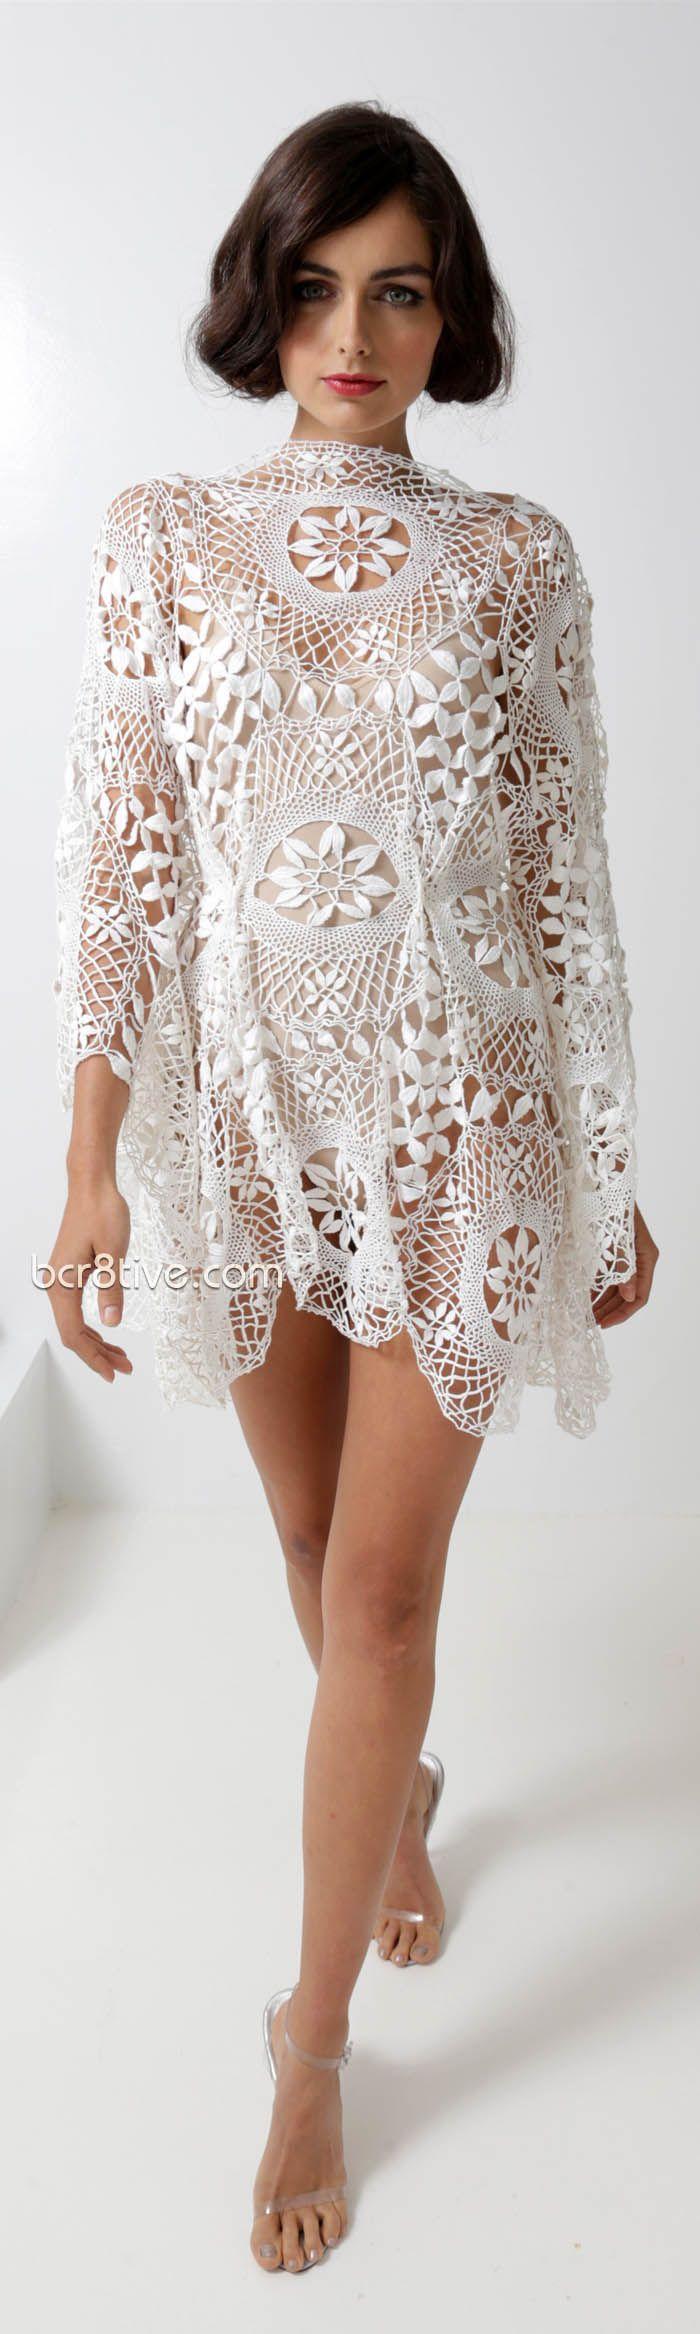 2963 best bohemia gitana crochet y m s images on - Norma kamali costumi da bagno ...